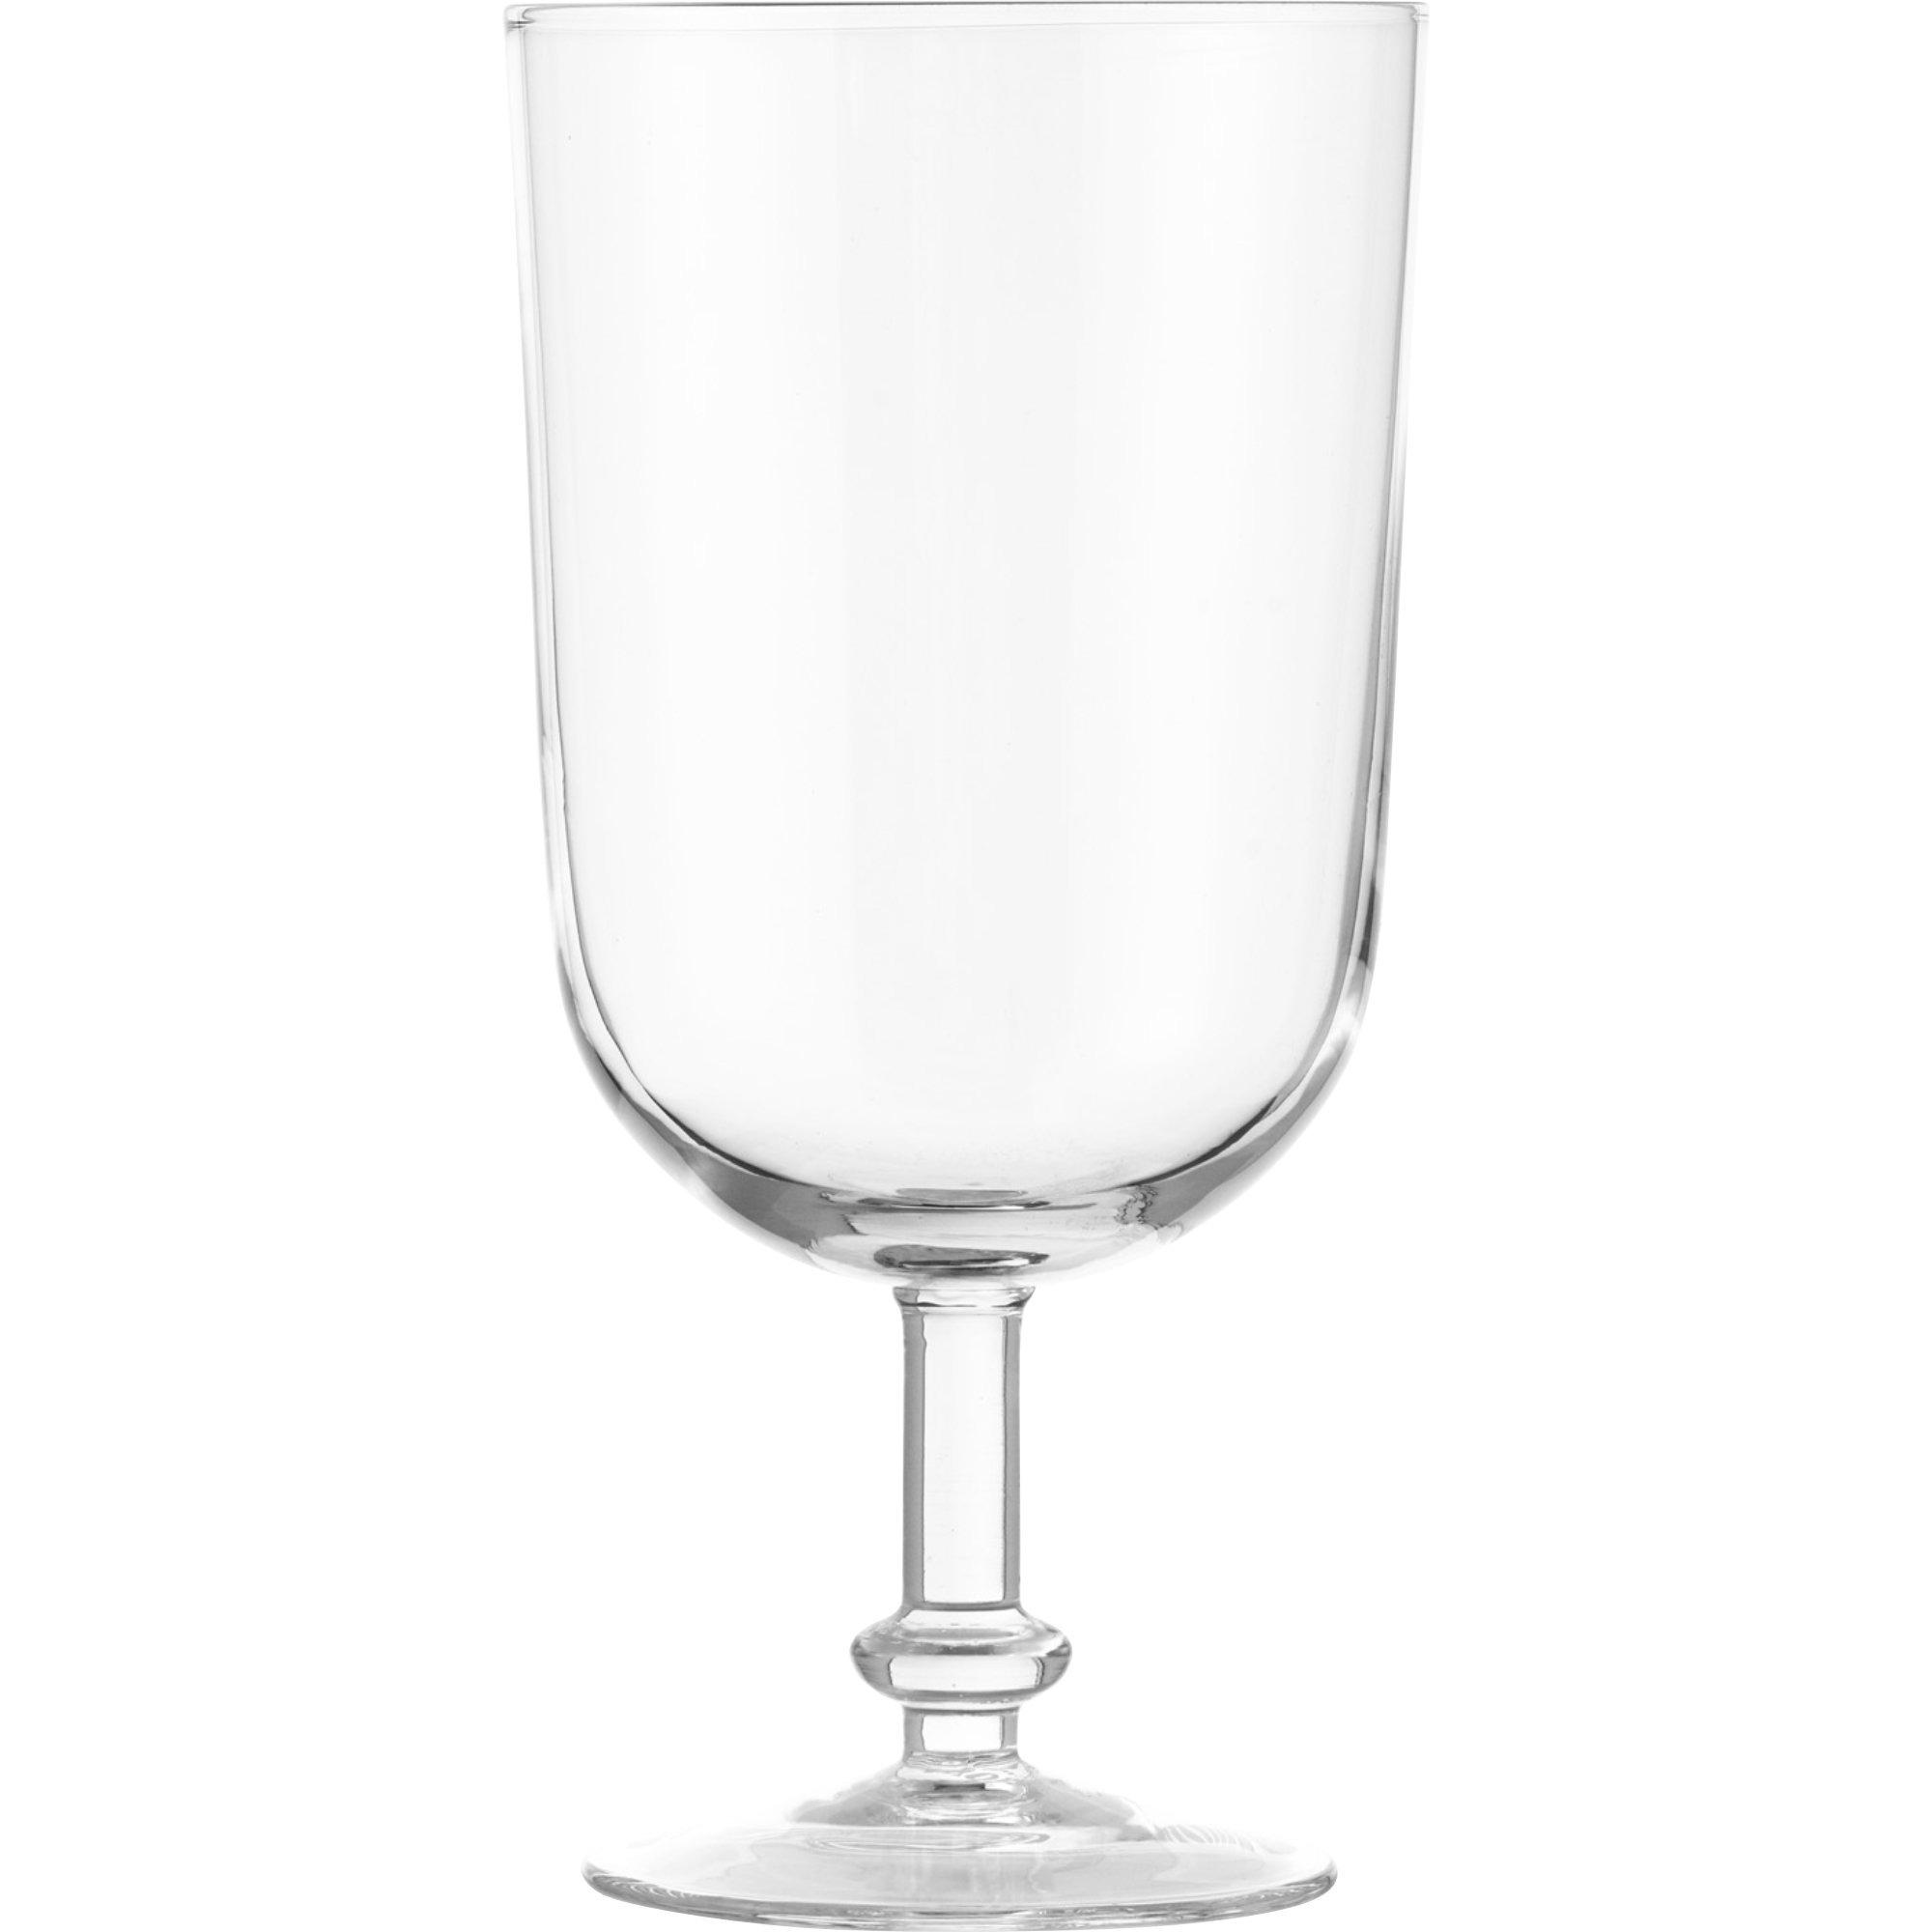 Normann Copenhagen Banquet Öl Glas 47 cl Klar